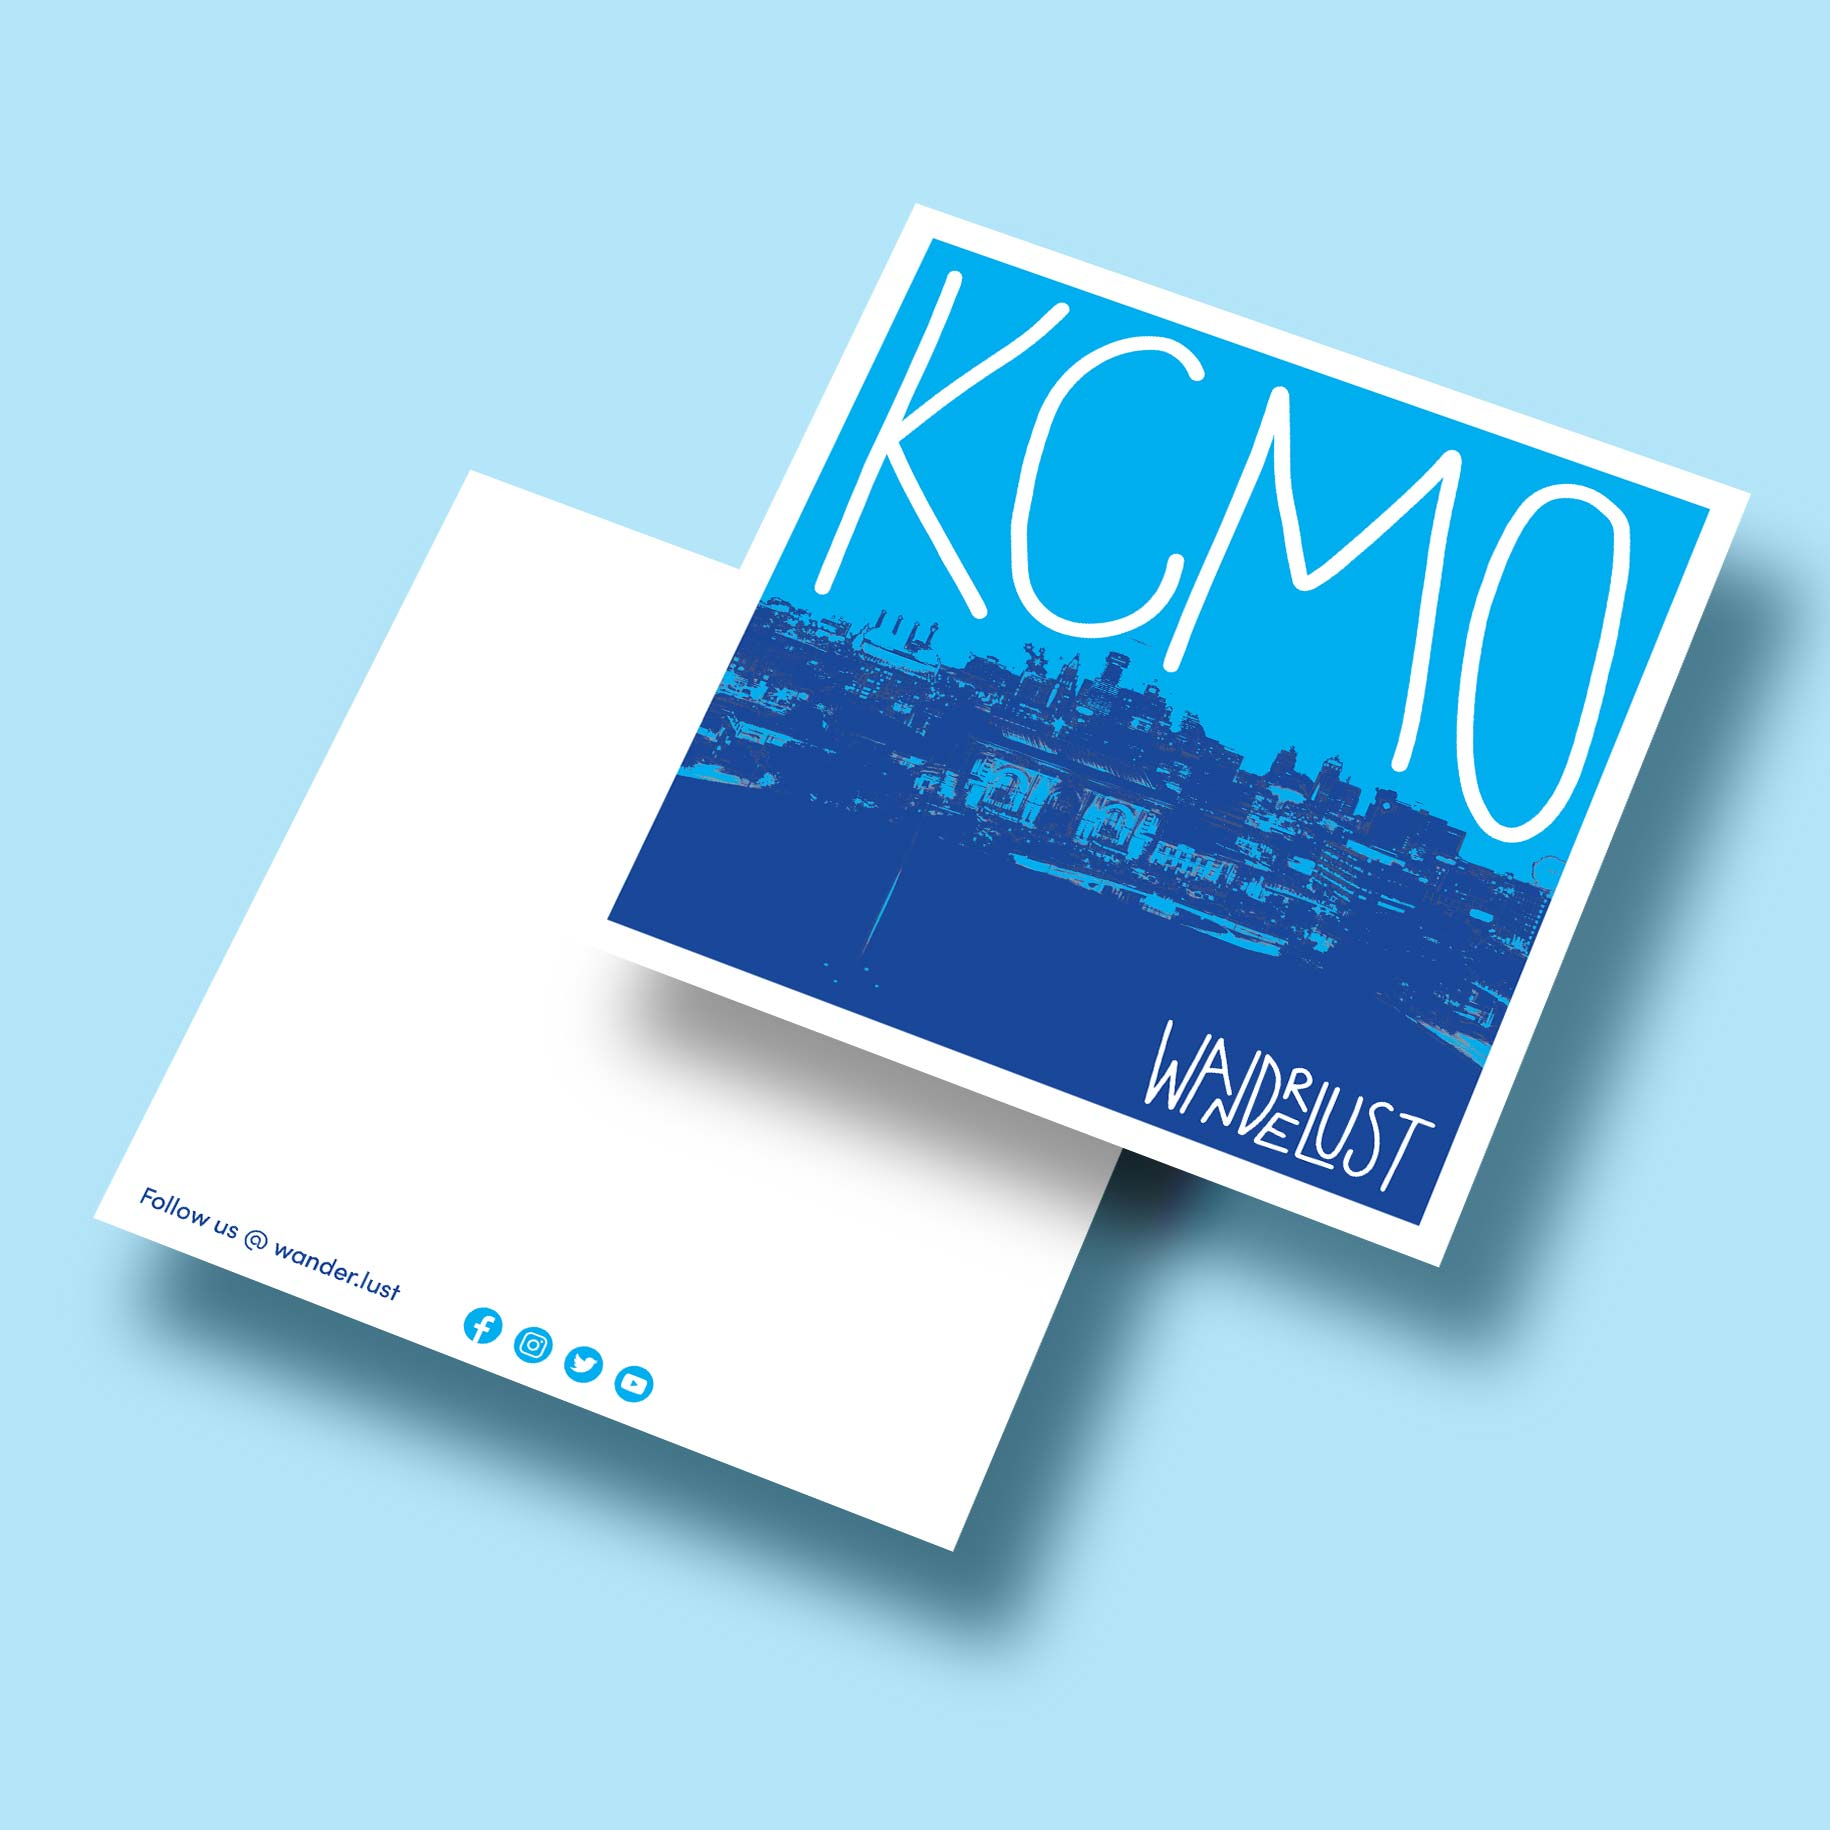 KCMO Postcard